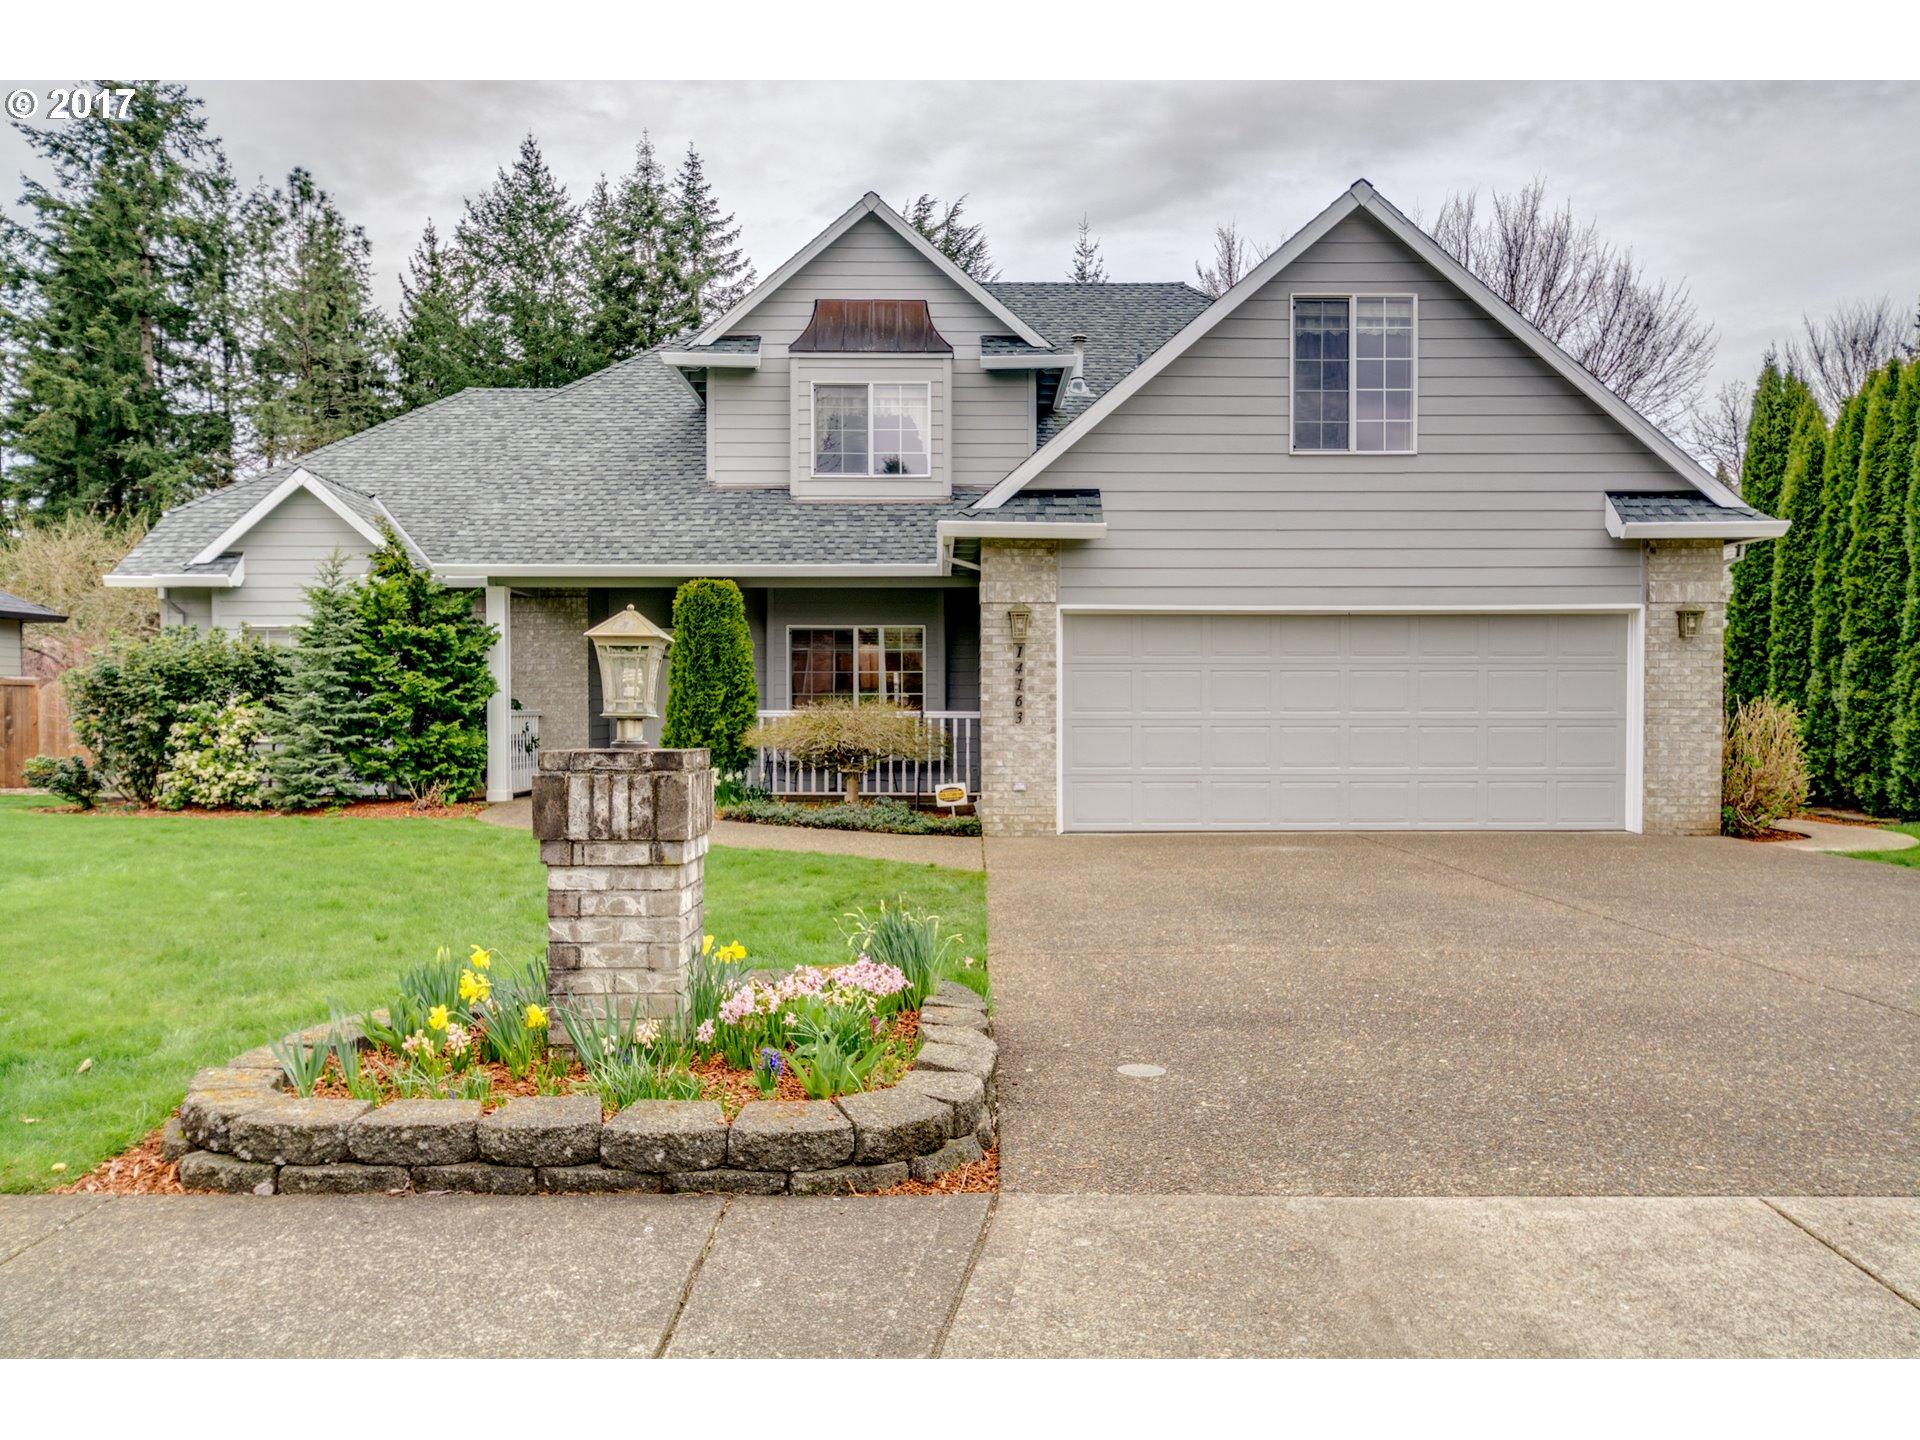 14163 CONWAY DR, Oregon City, OR 97045